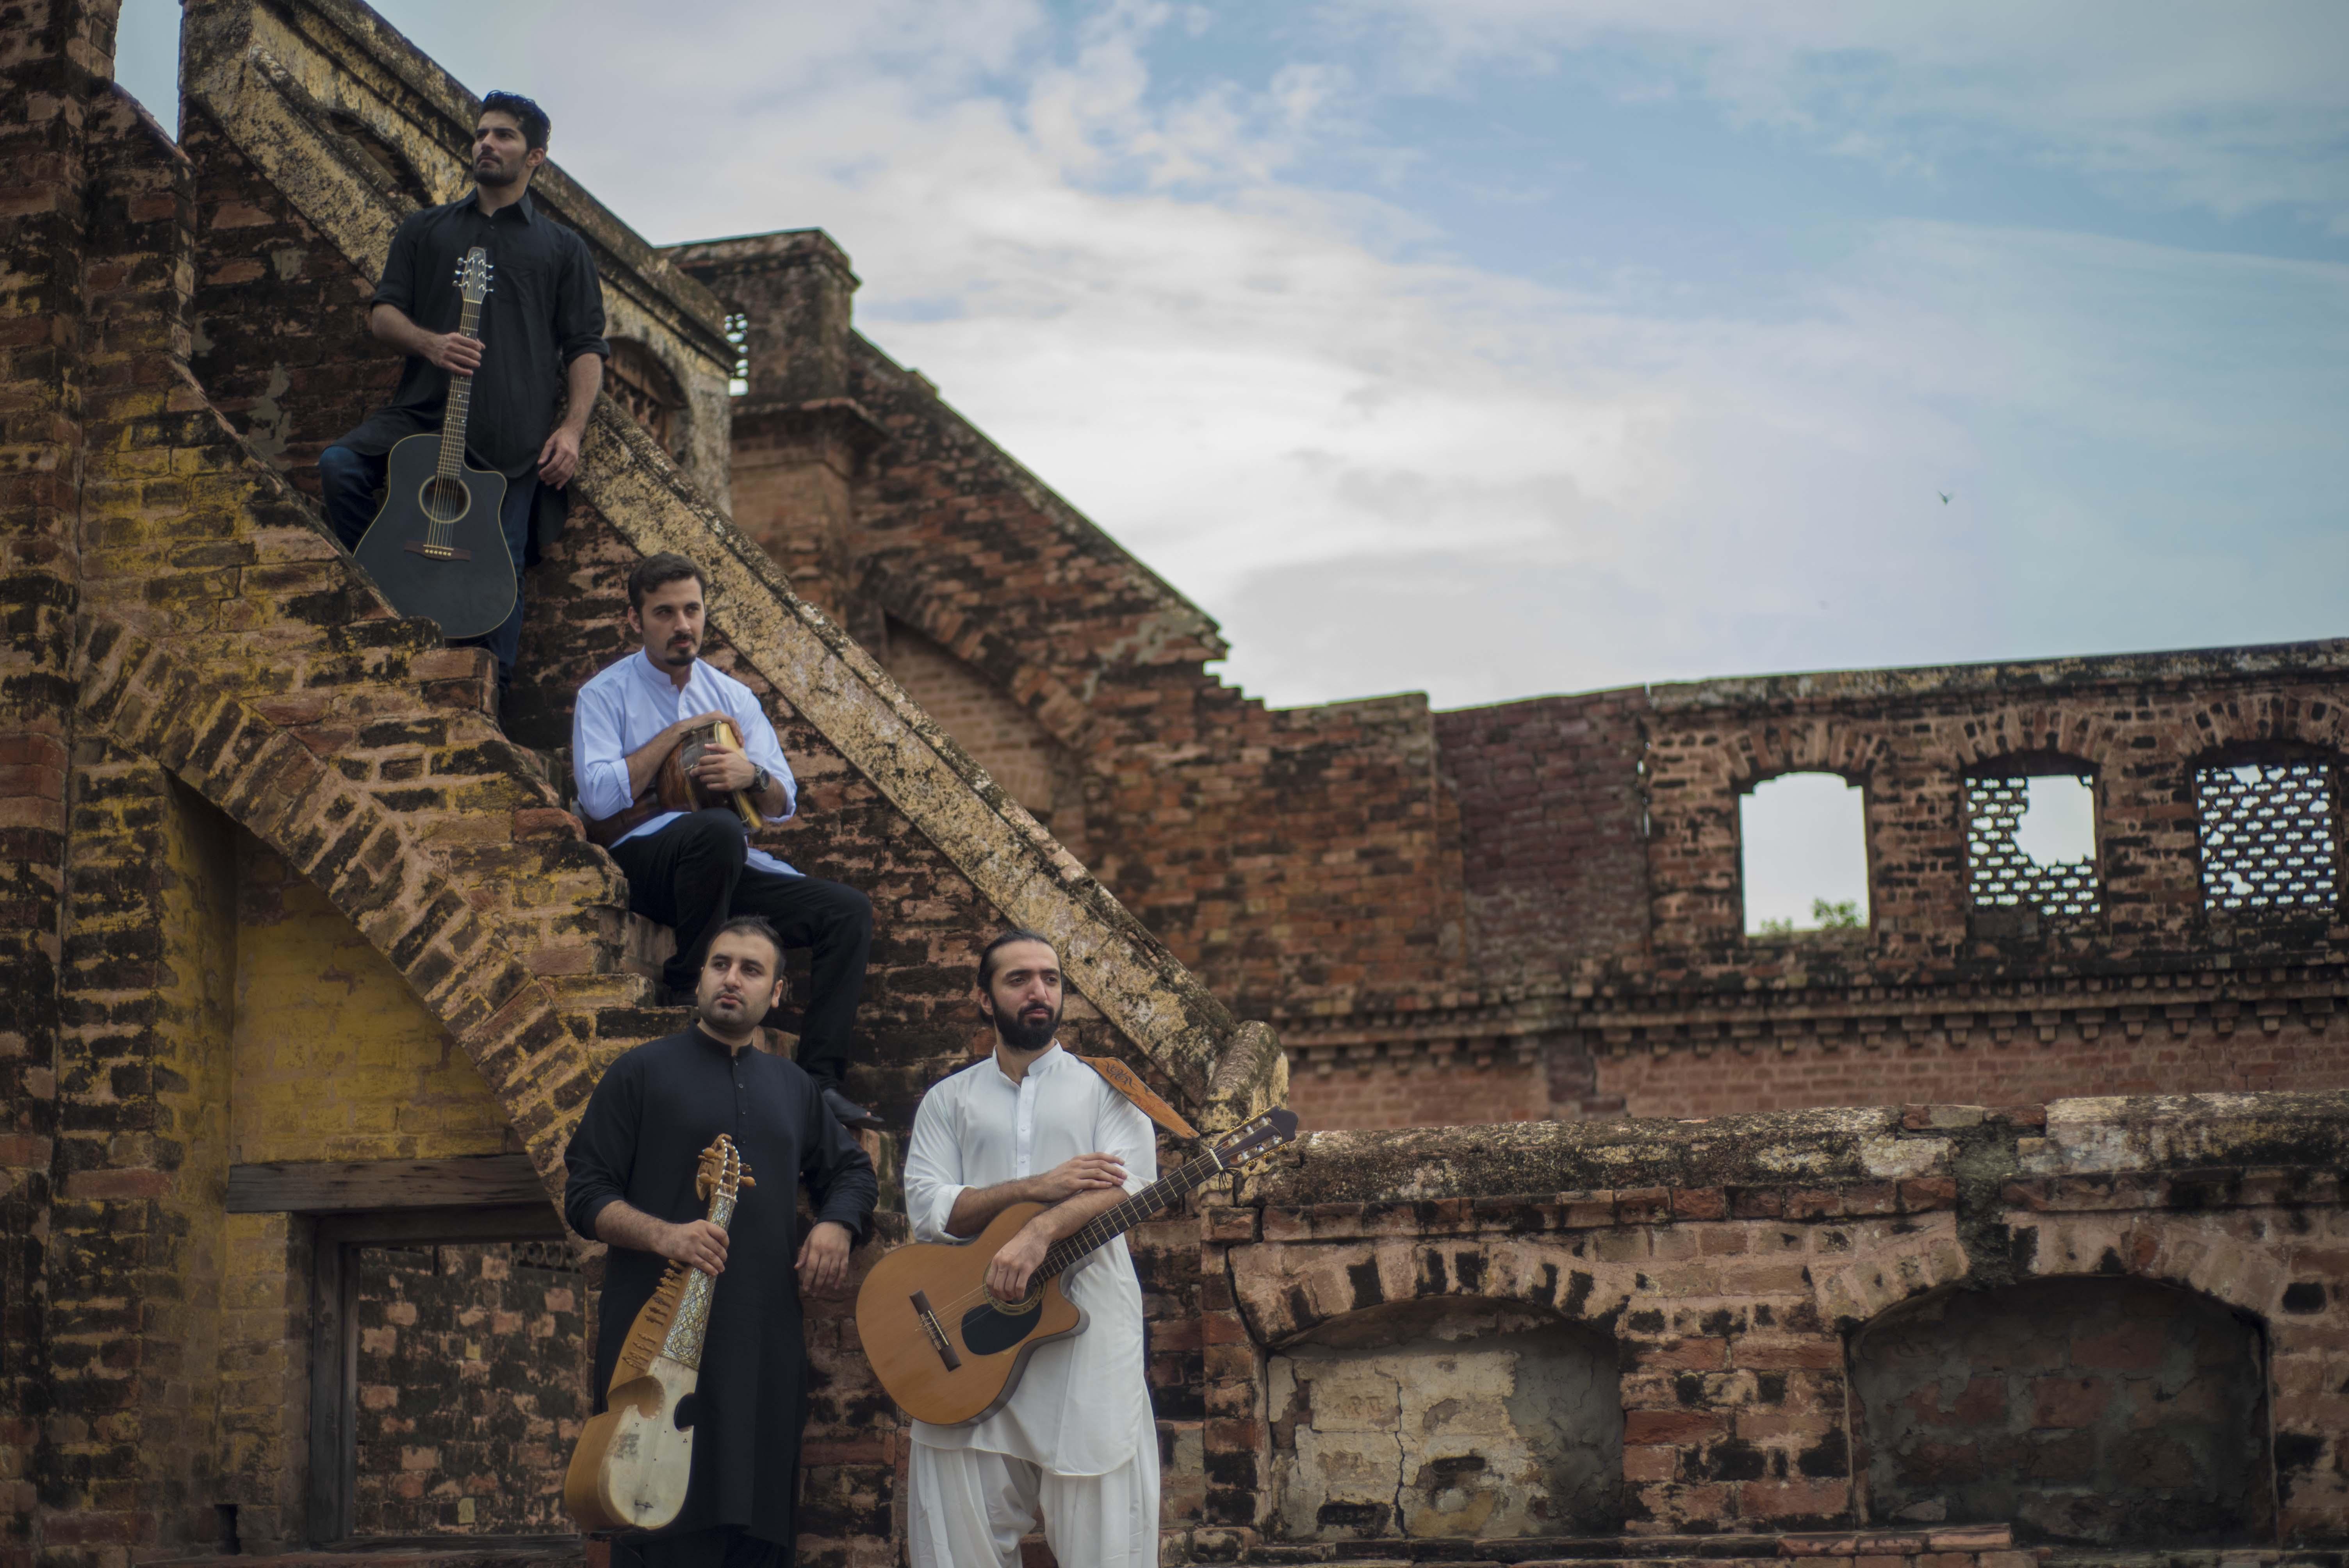 rabab to rock alchemy festival in uk